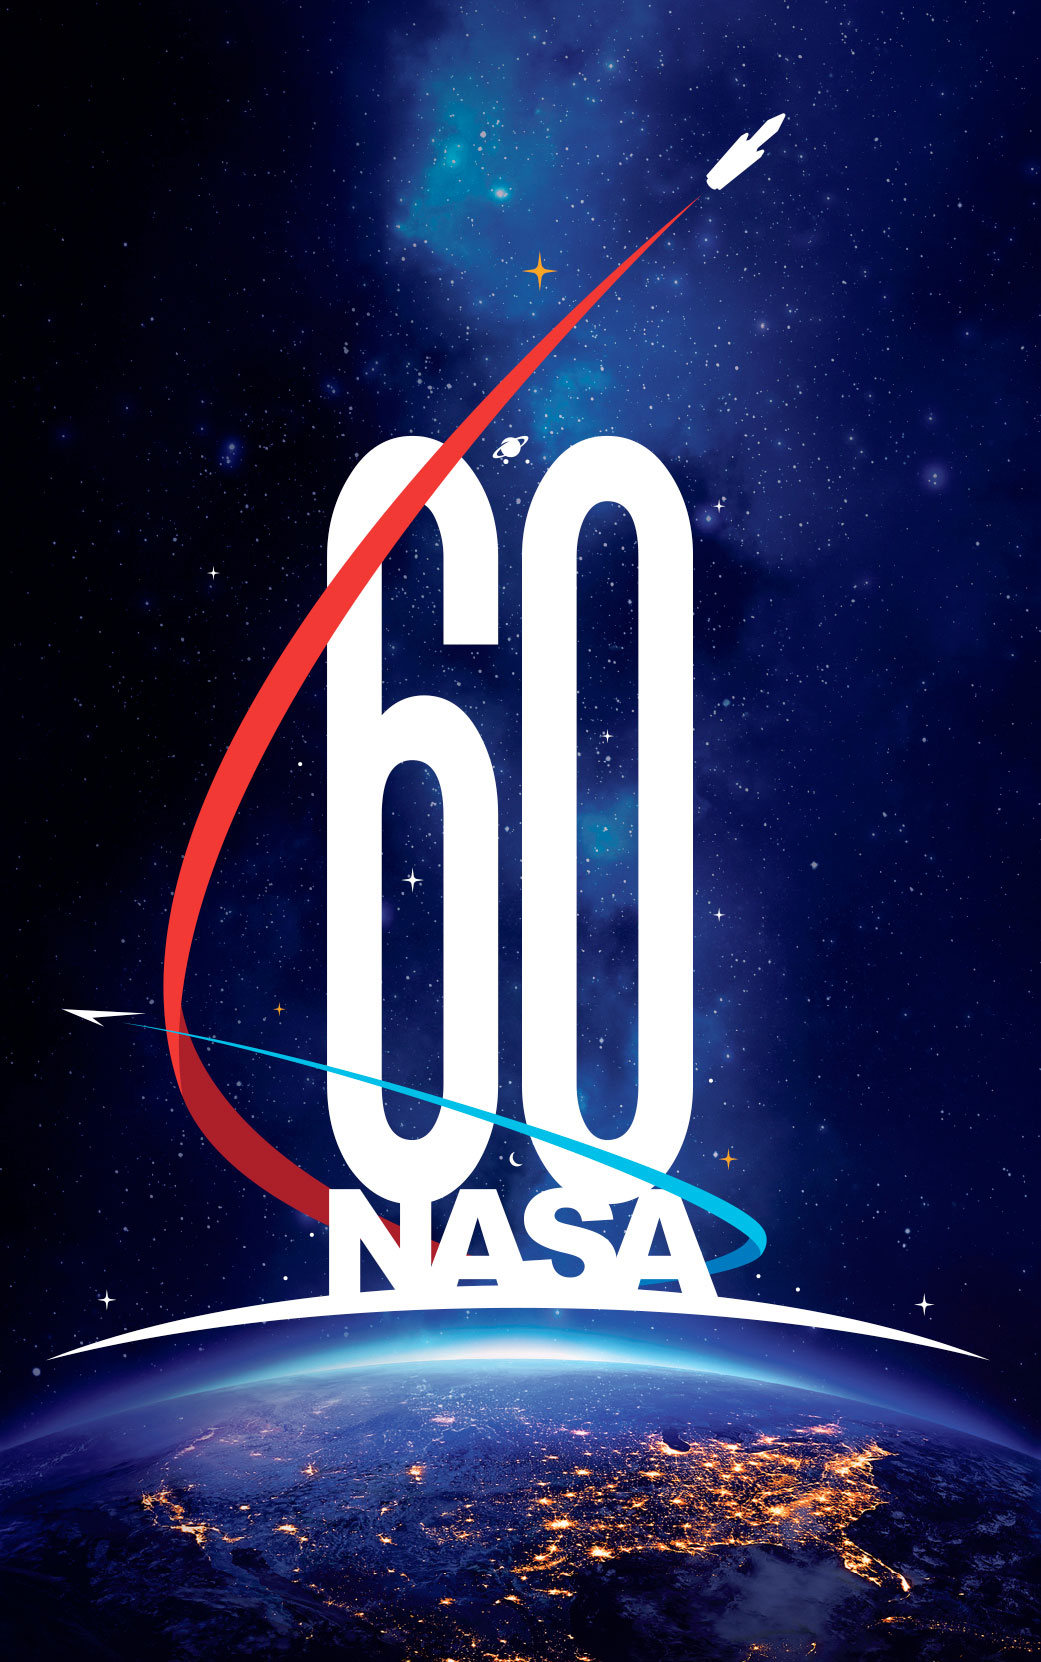 Nasas new 60th anniversary logo depicts historic past and nasas 60th anniversary logo created by matthew skeins nasa altavistaventures Image collections